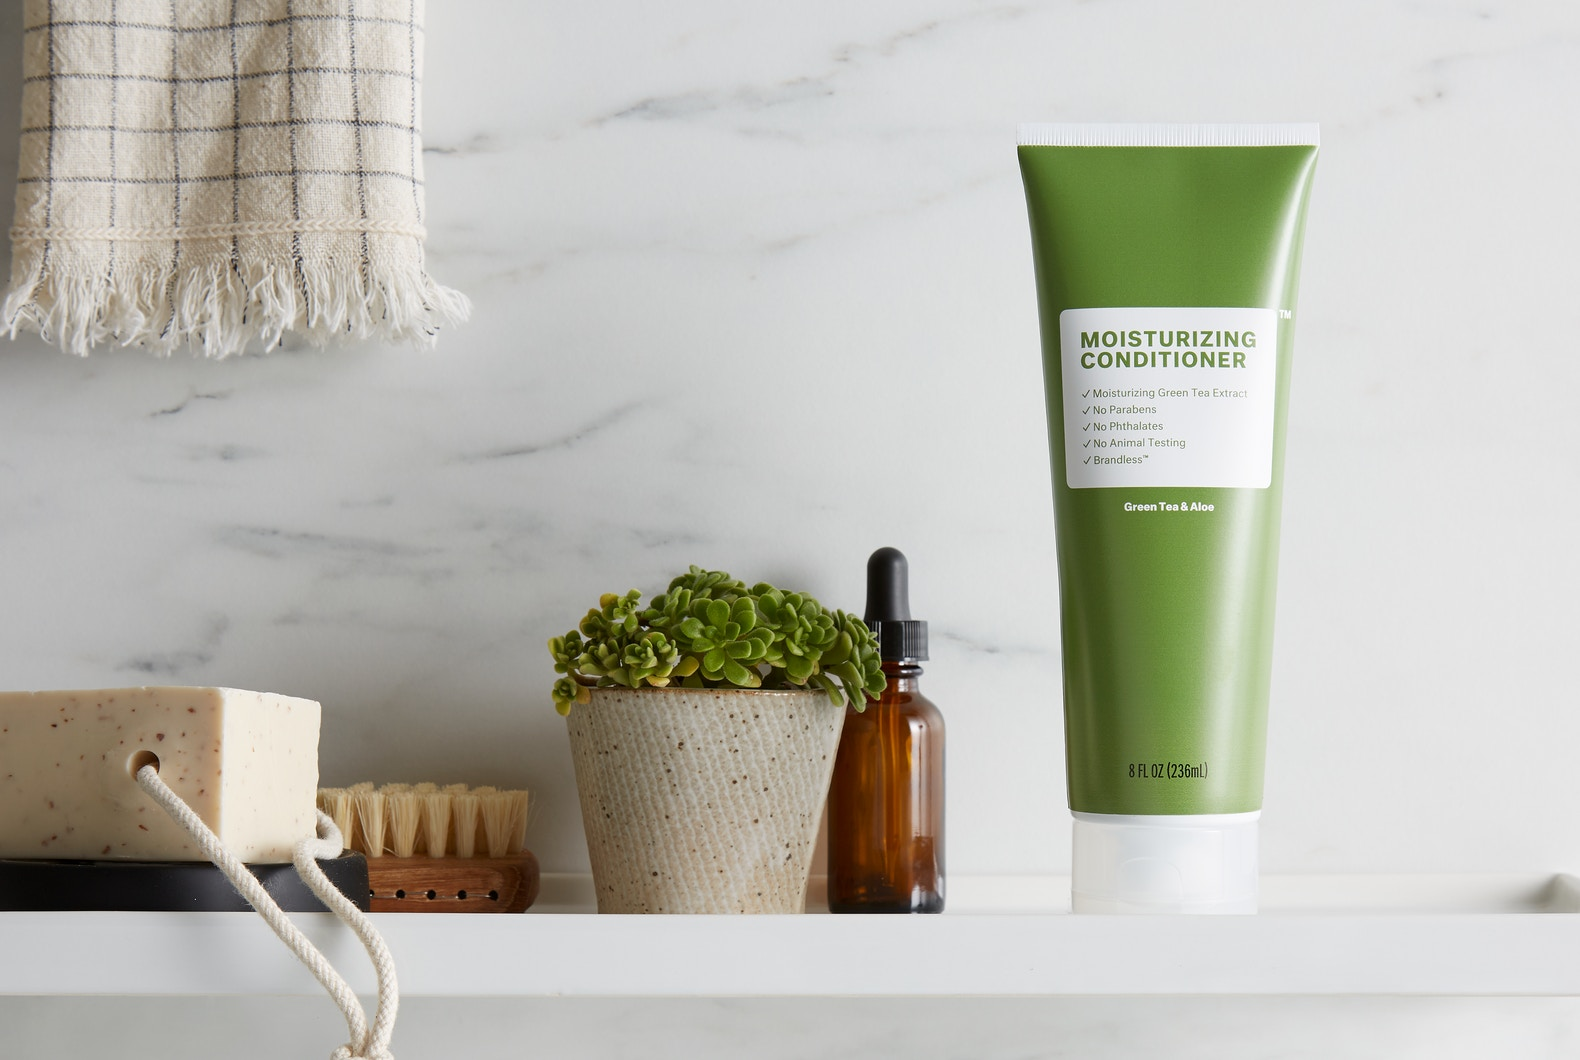 Green Tea & Aloe Moisturizing Conditioner